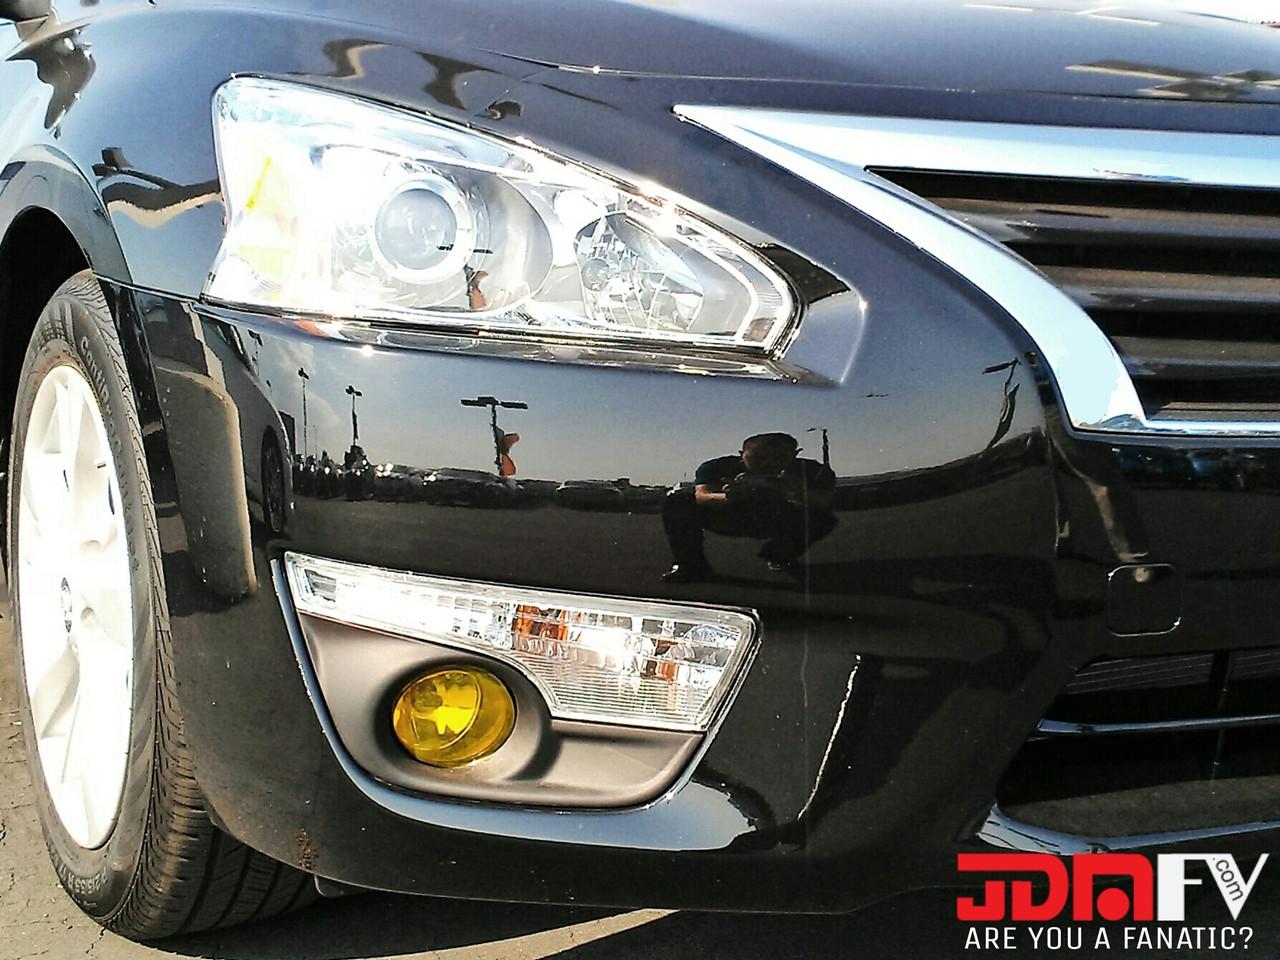 2013 Nissan Altima Sedan Precut Yellow Fog Light Overlays Tint